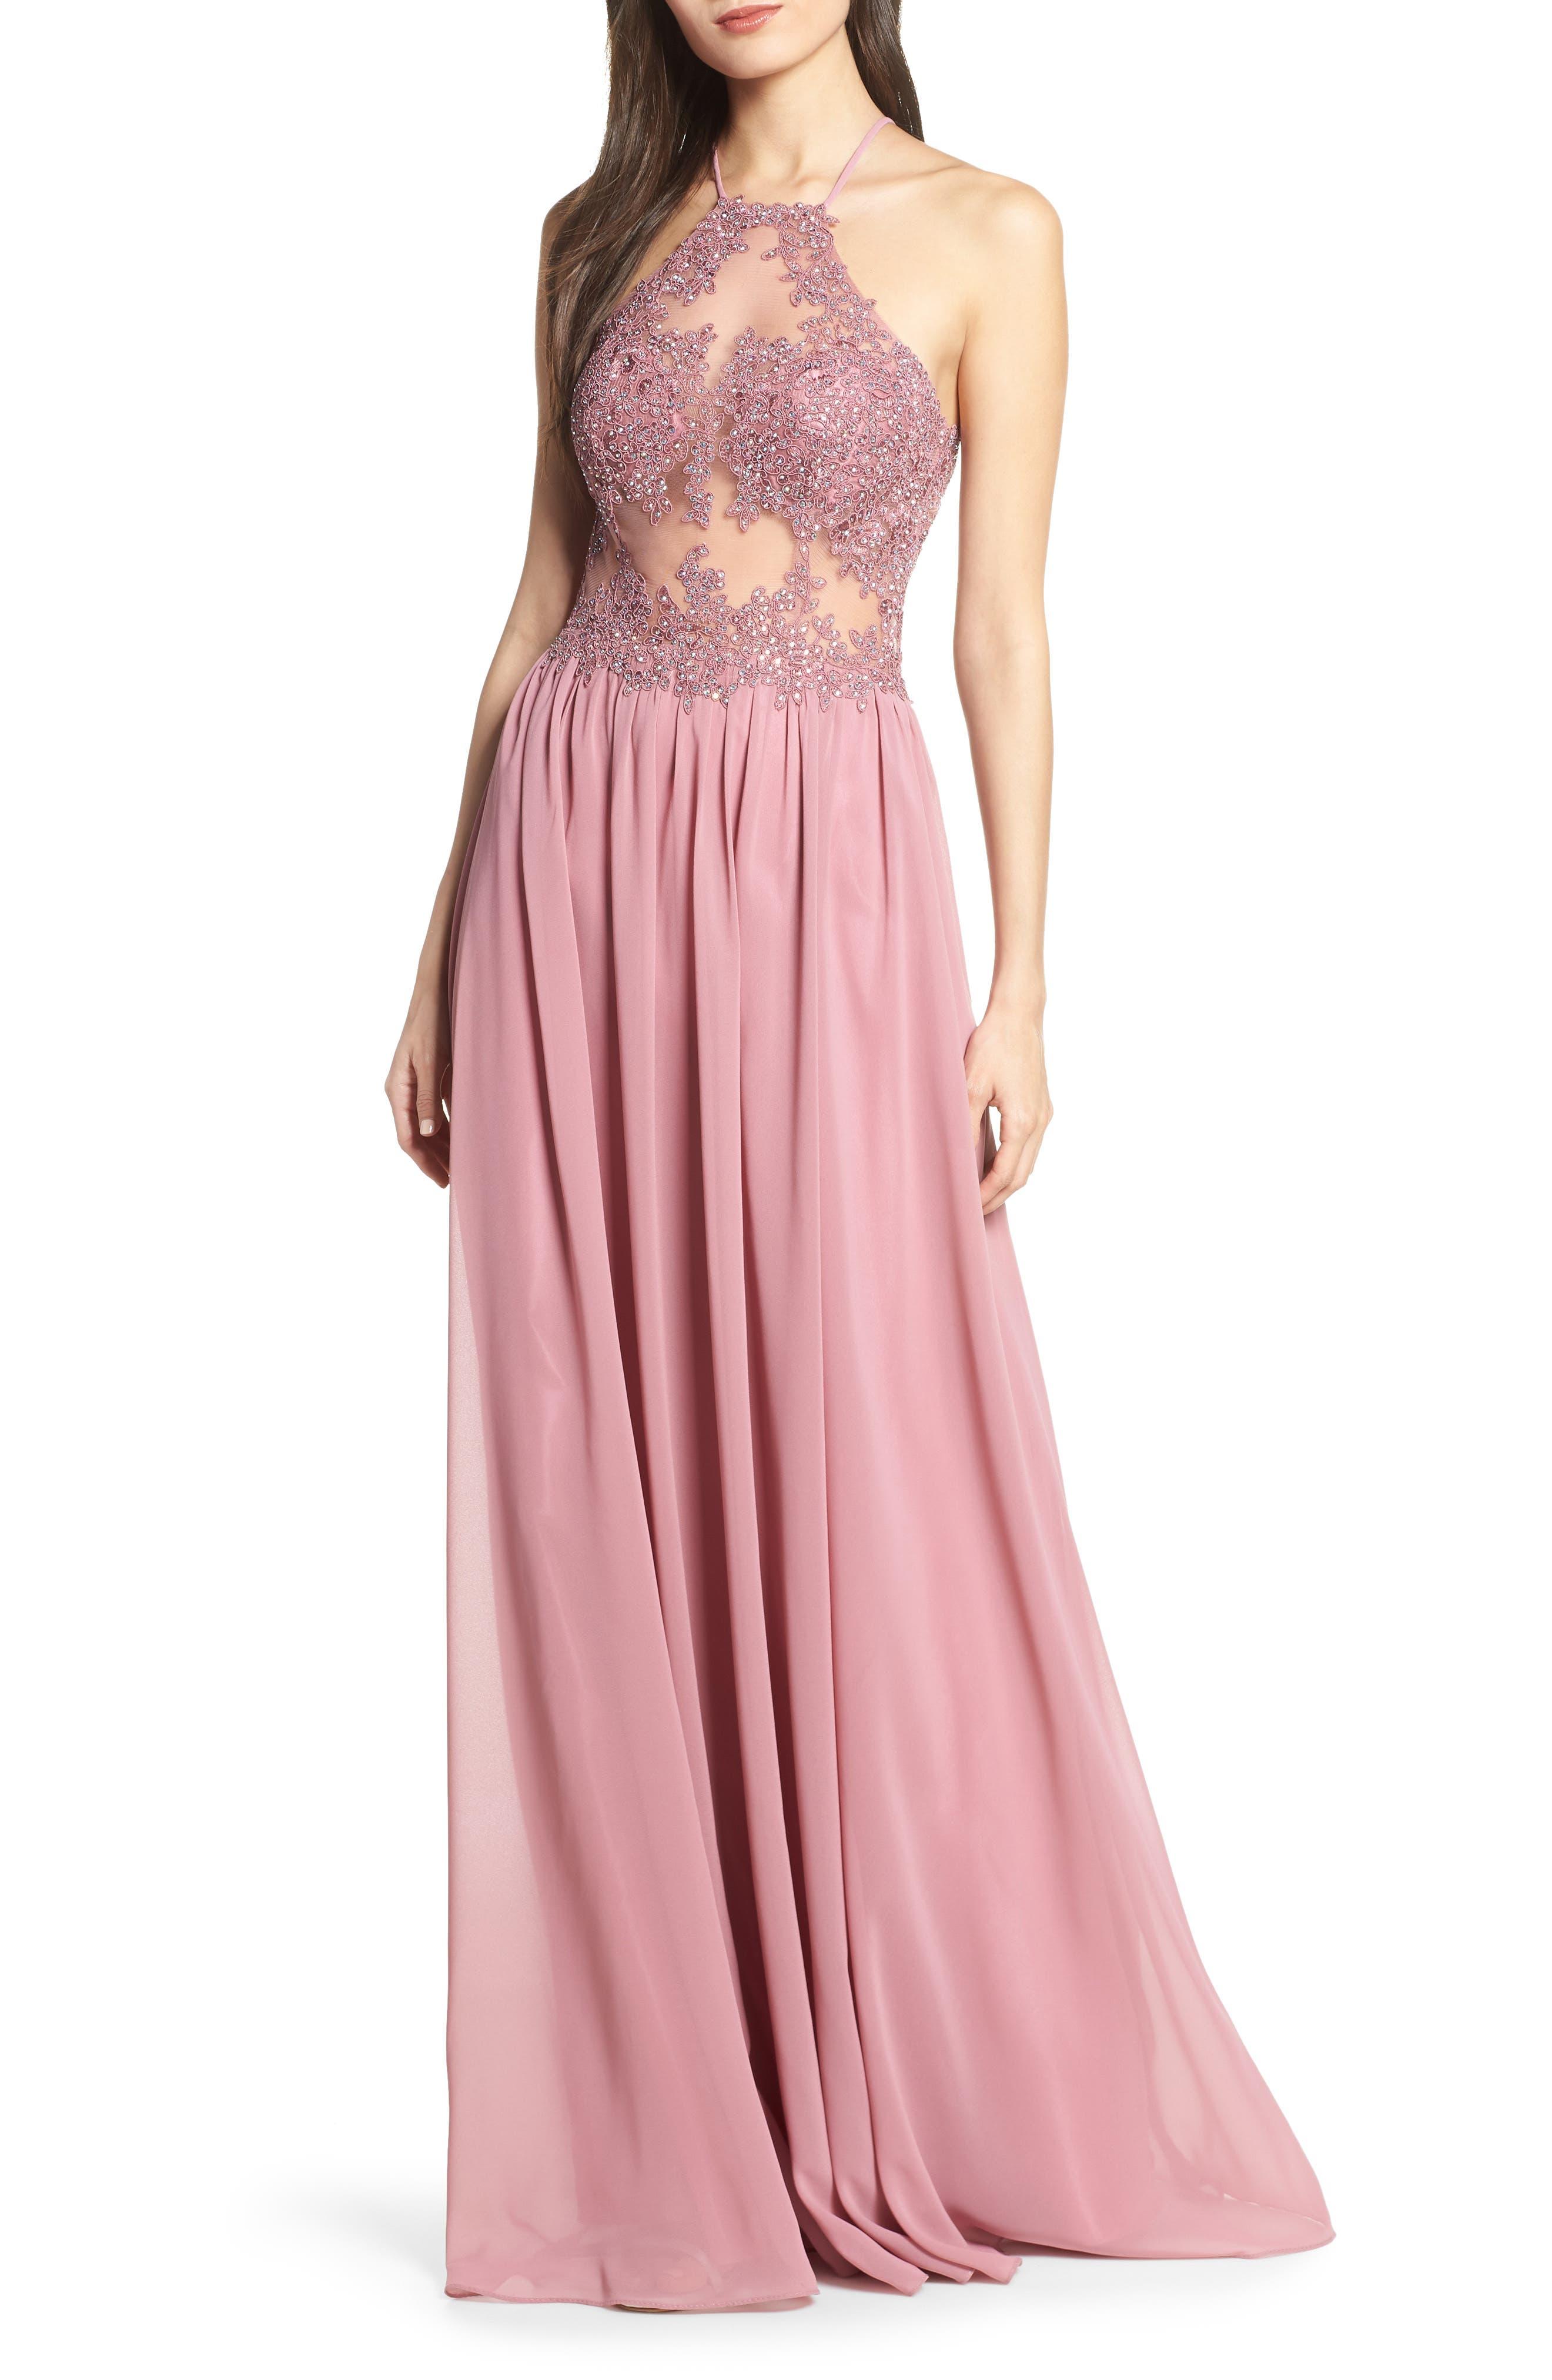 Blondie Nites Embroidered Illusion Halter Bodice Evening Dress, Pink